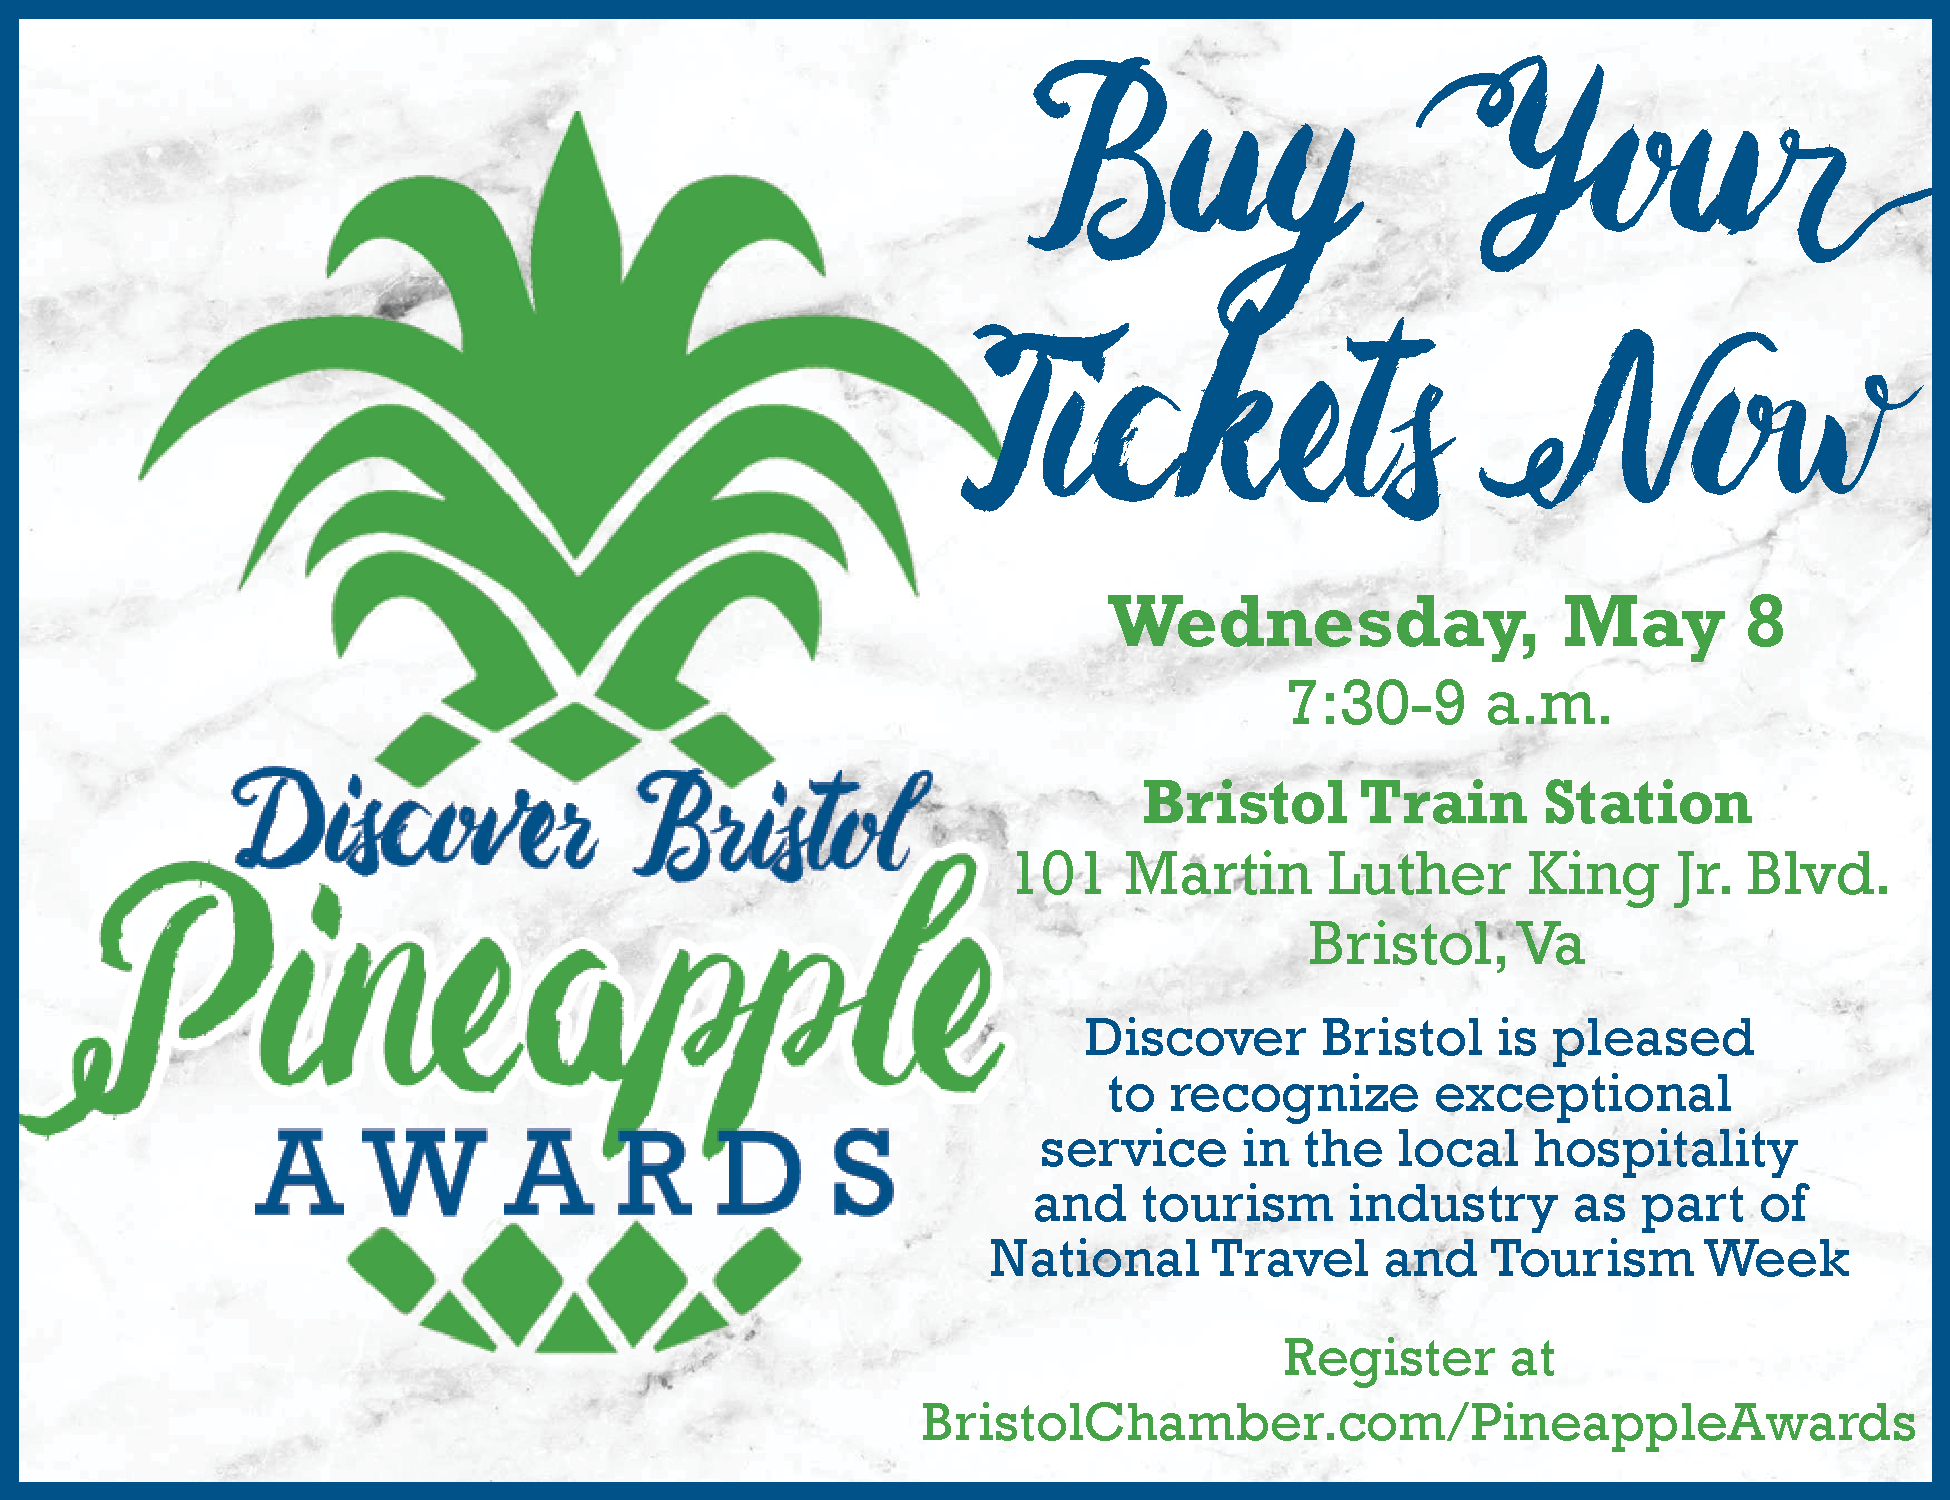 Discover Bristol Pineapple Awards - Bristol Chamber of